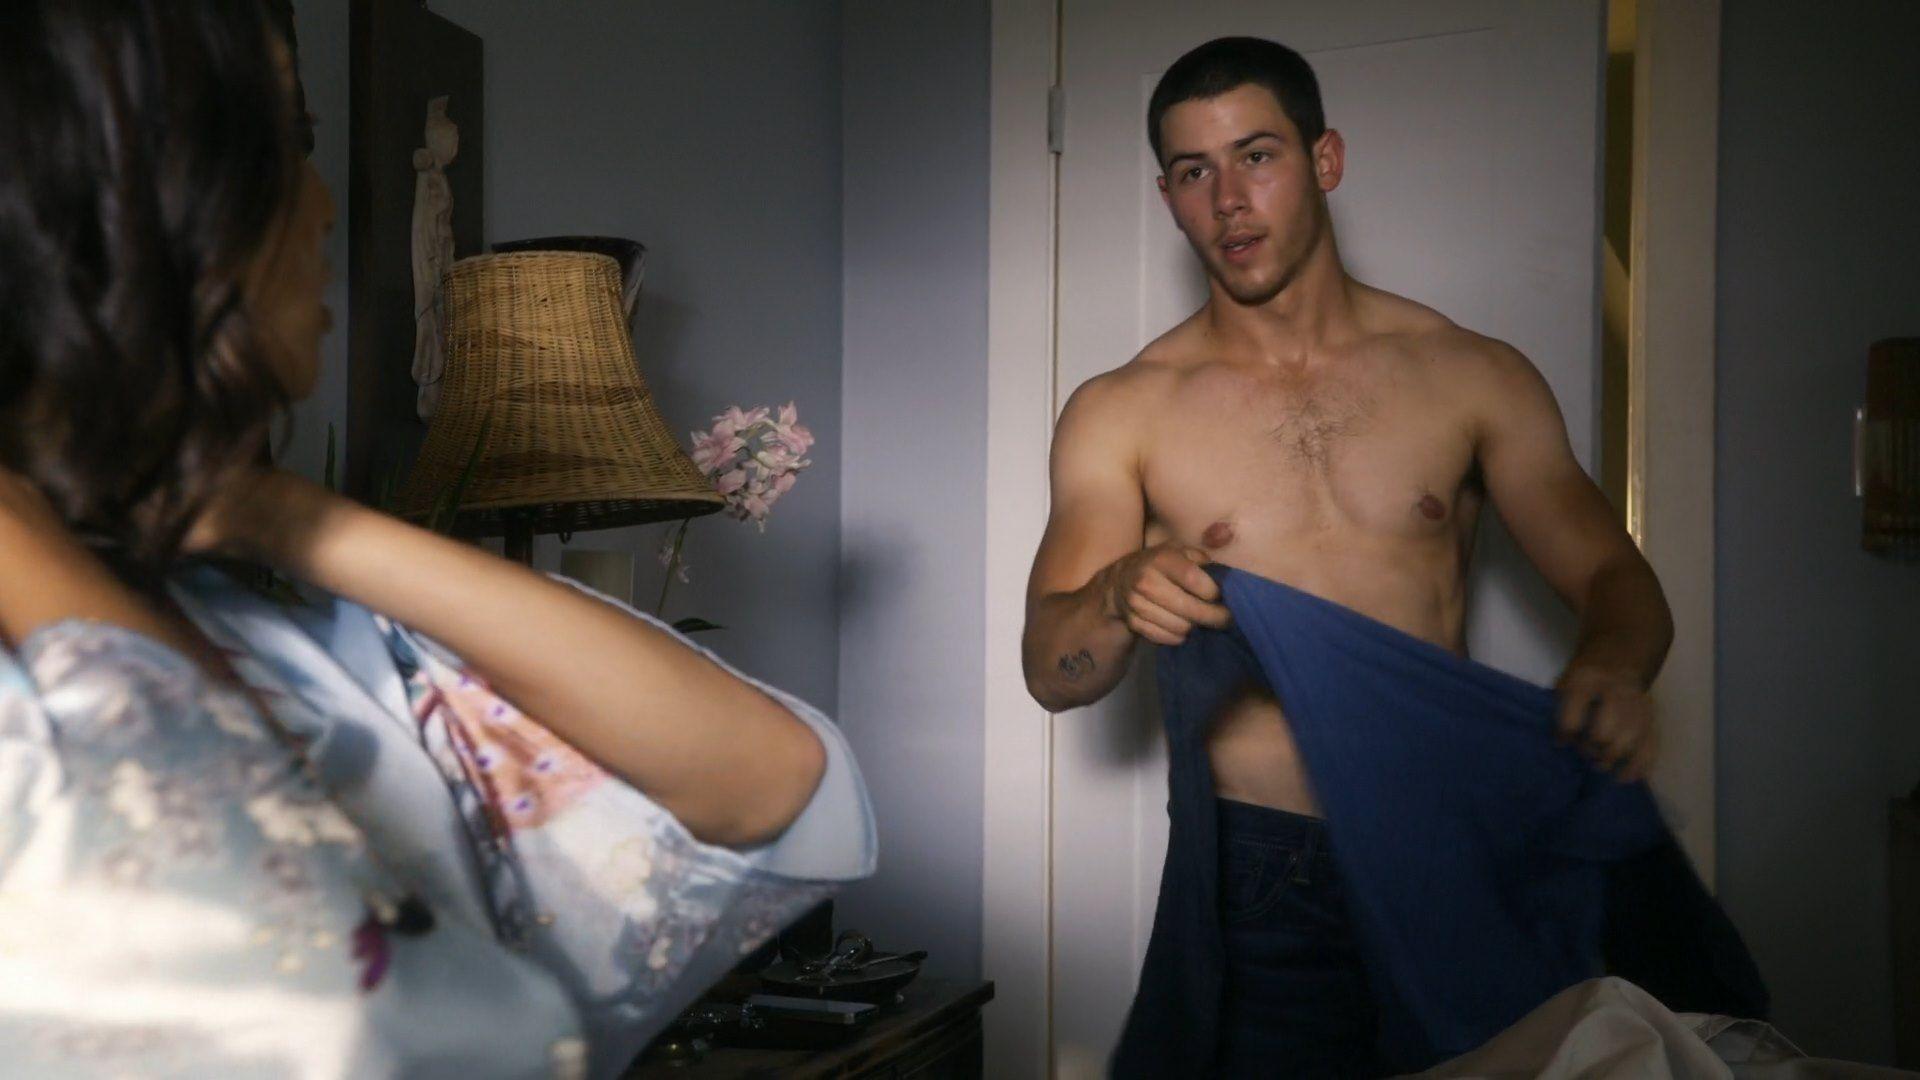 Samantha pornstar pics